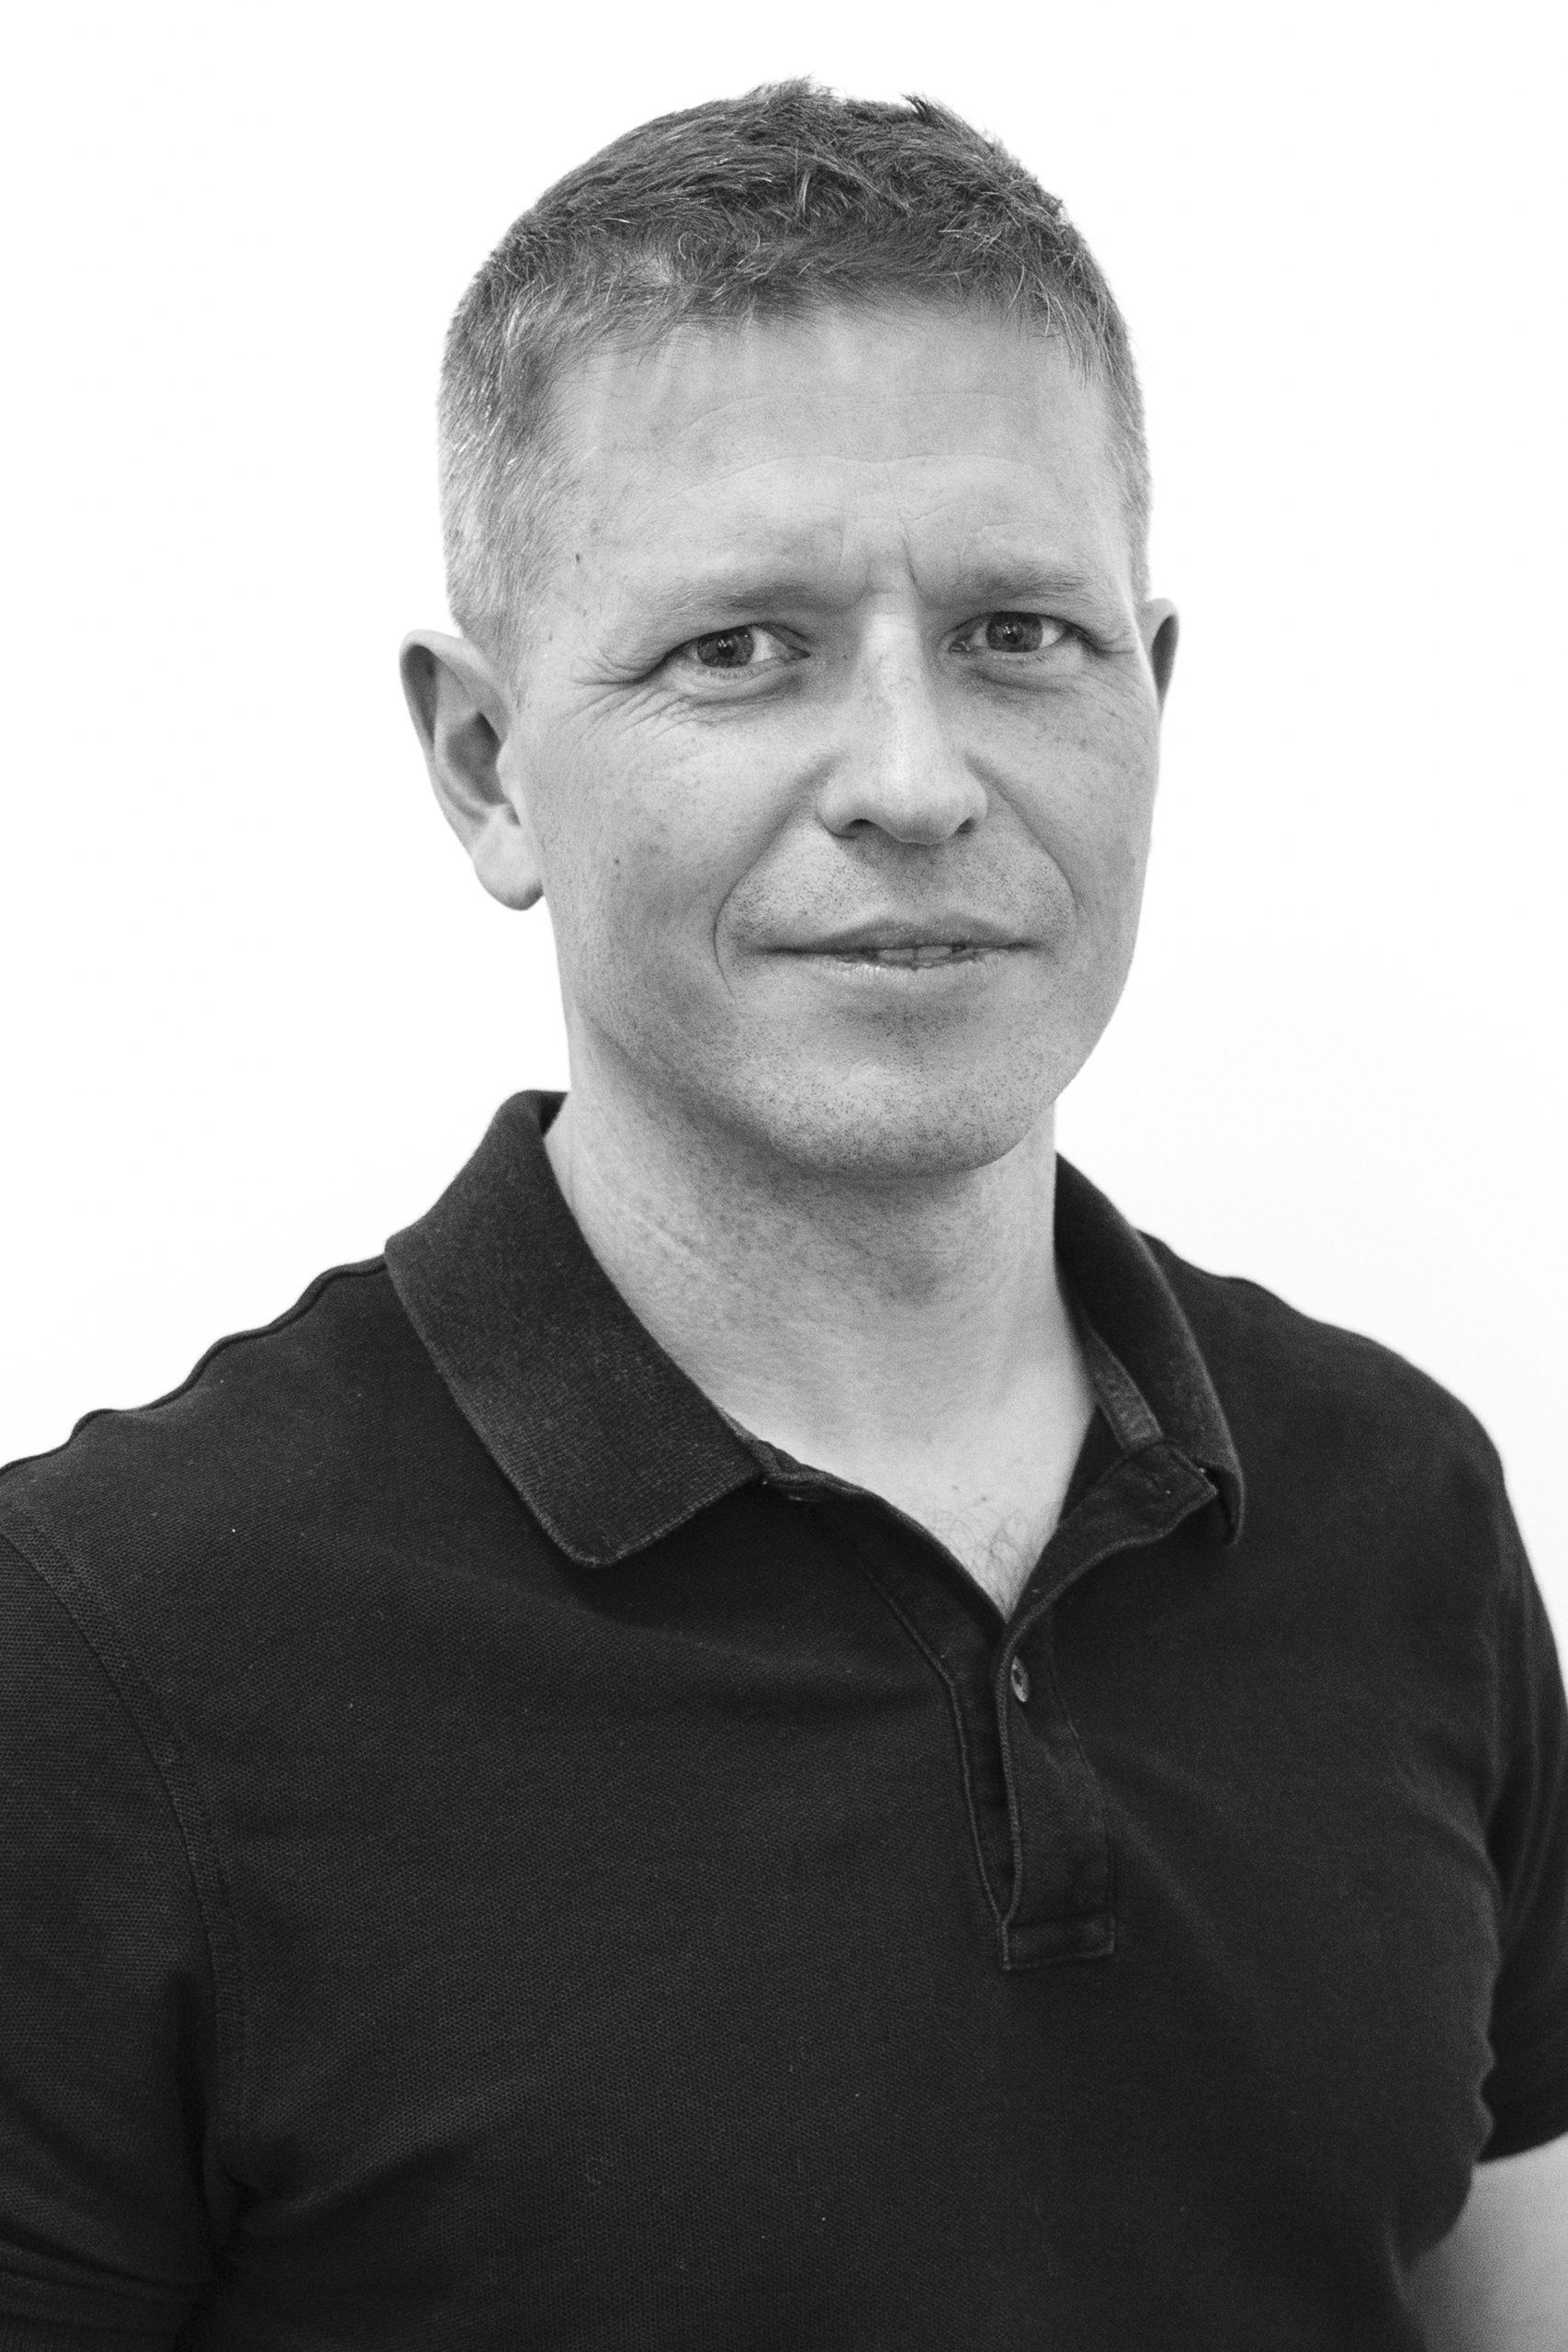 Paul Banham